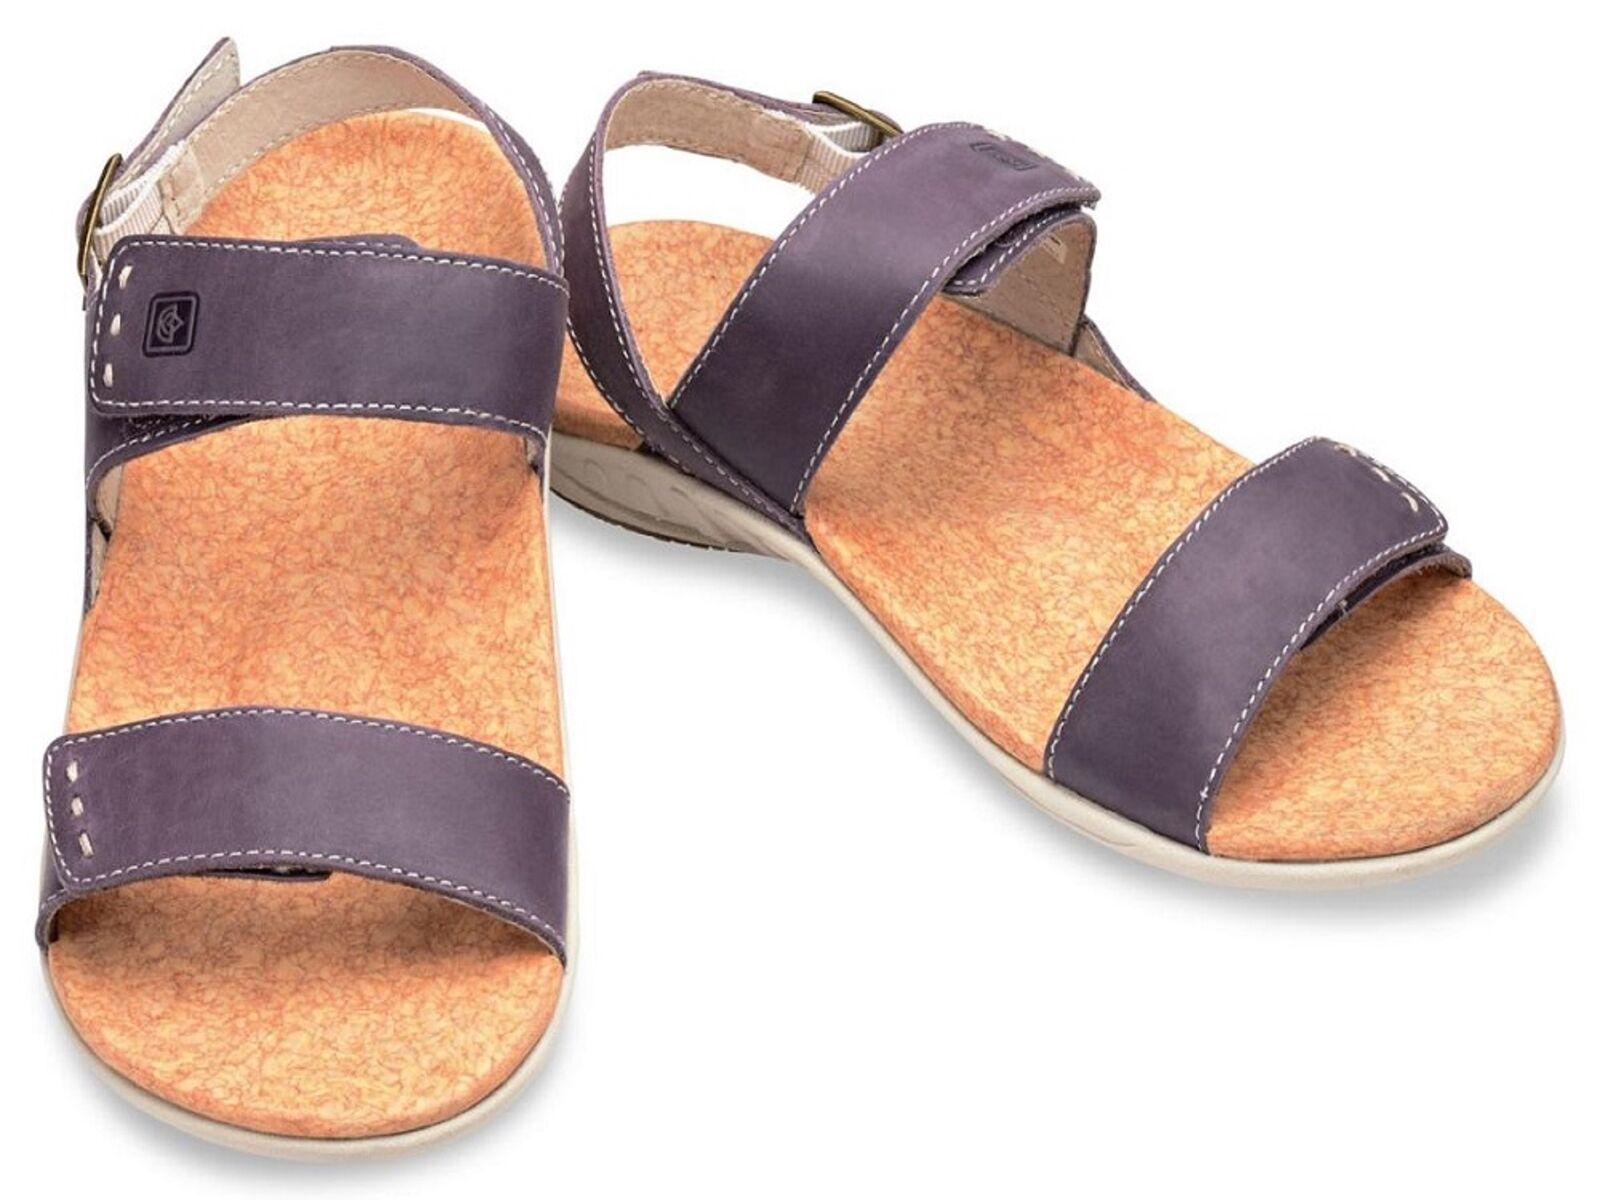 Spenco Alex Women's Strap Orthotic Sandals Purple, Size 11